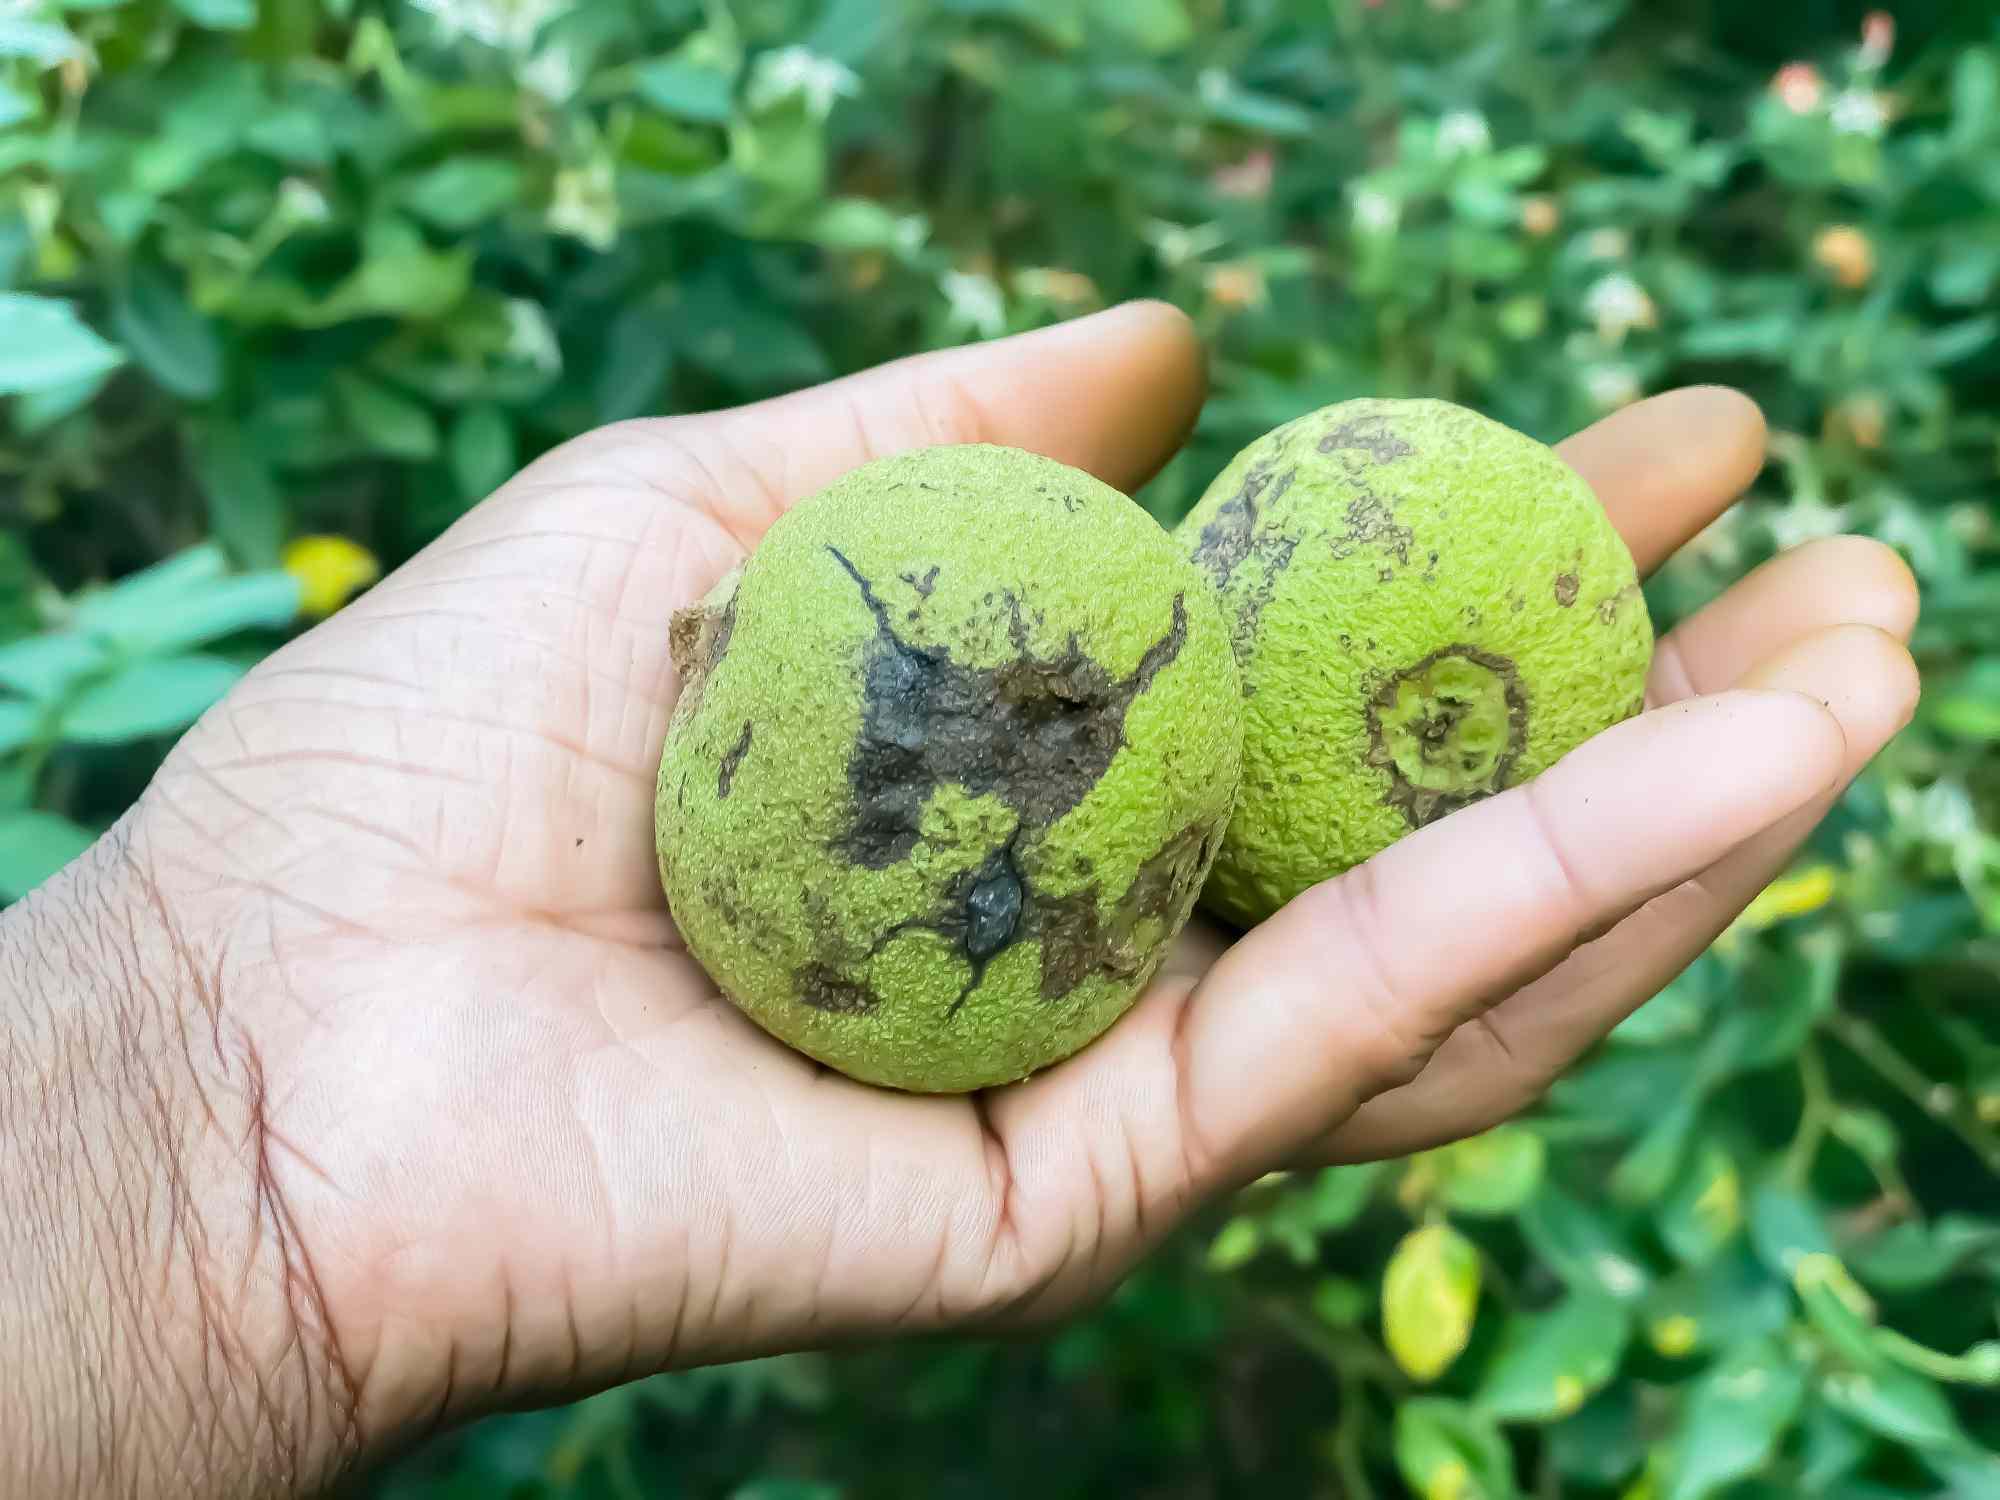 A hand holding Black Walnuts.